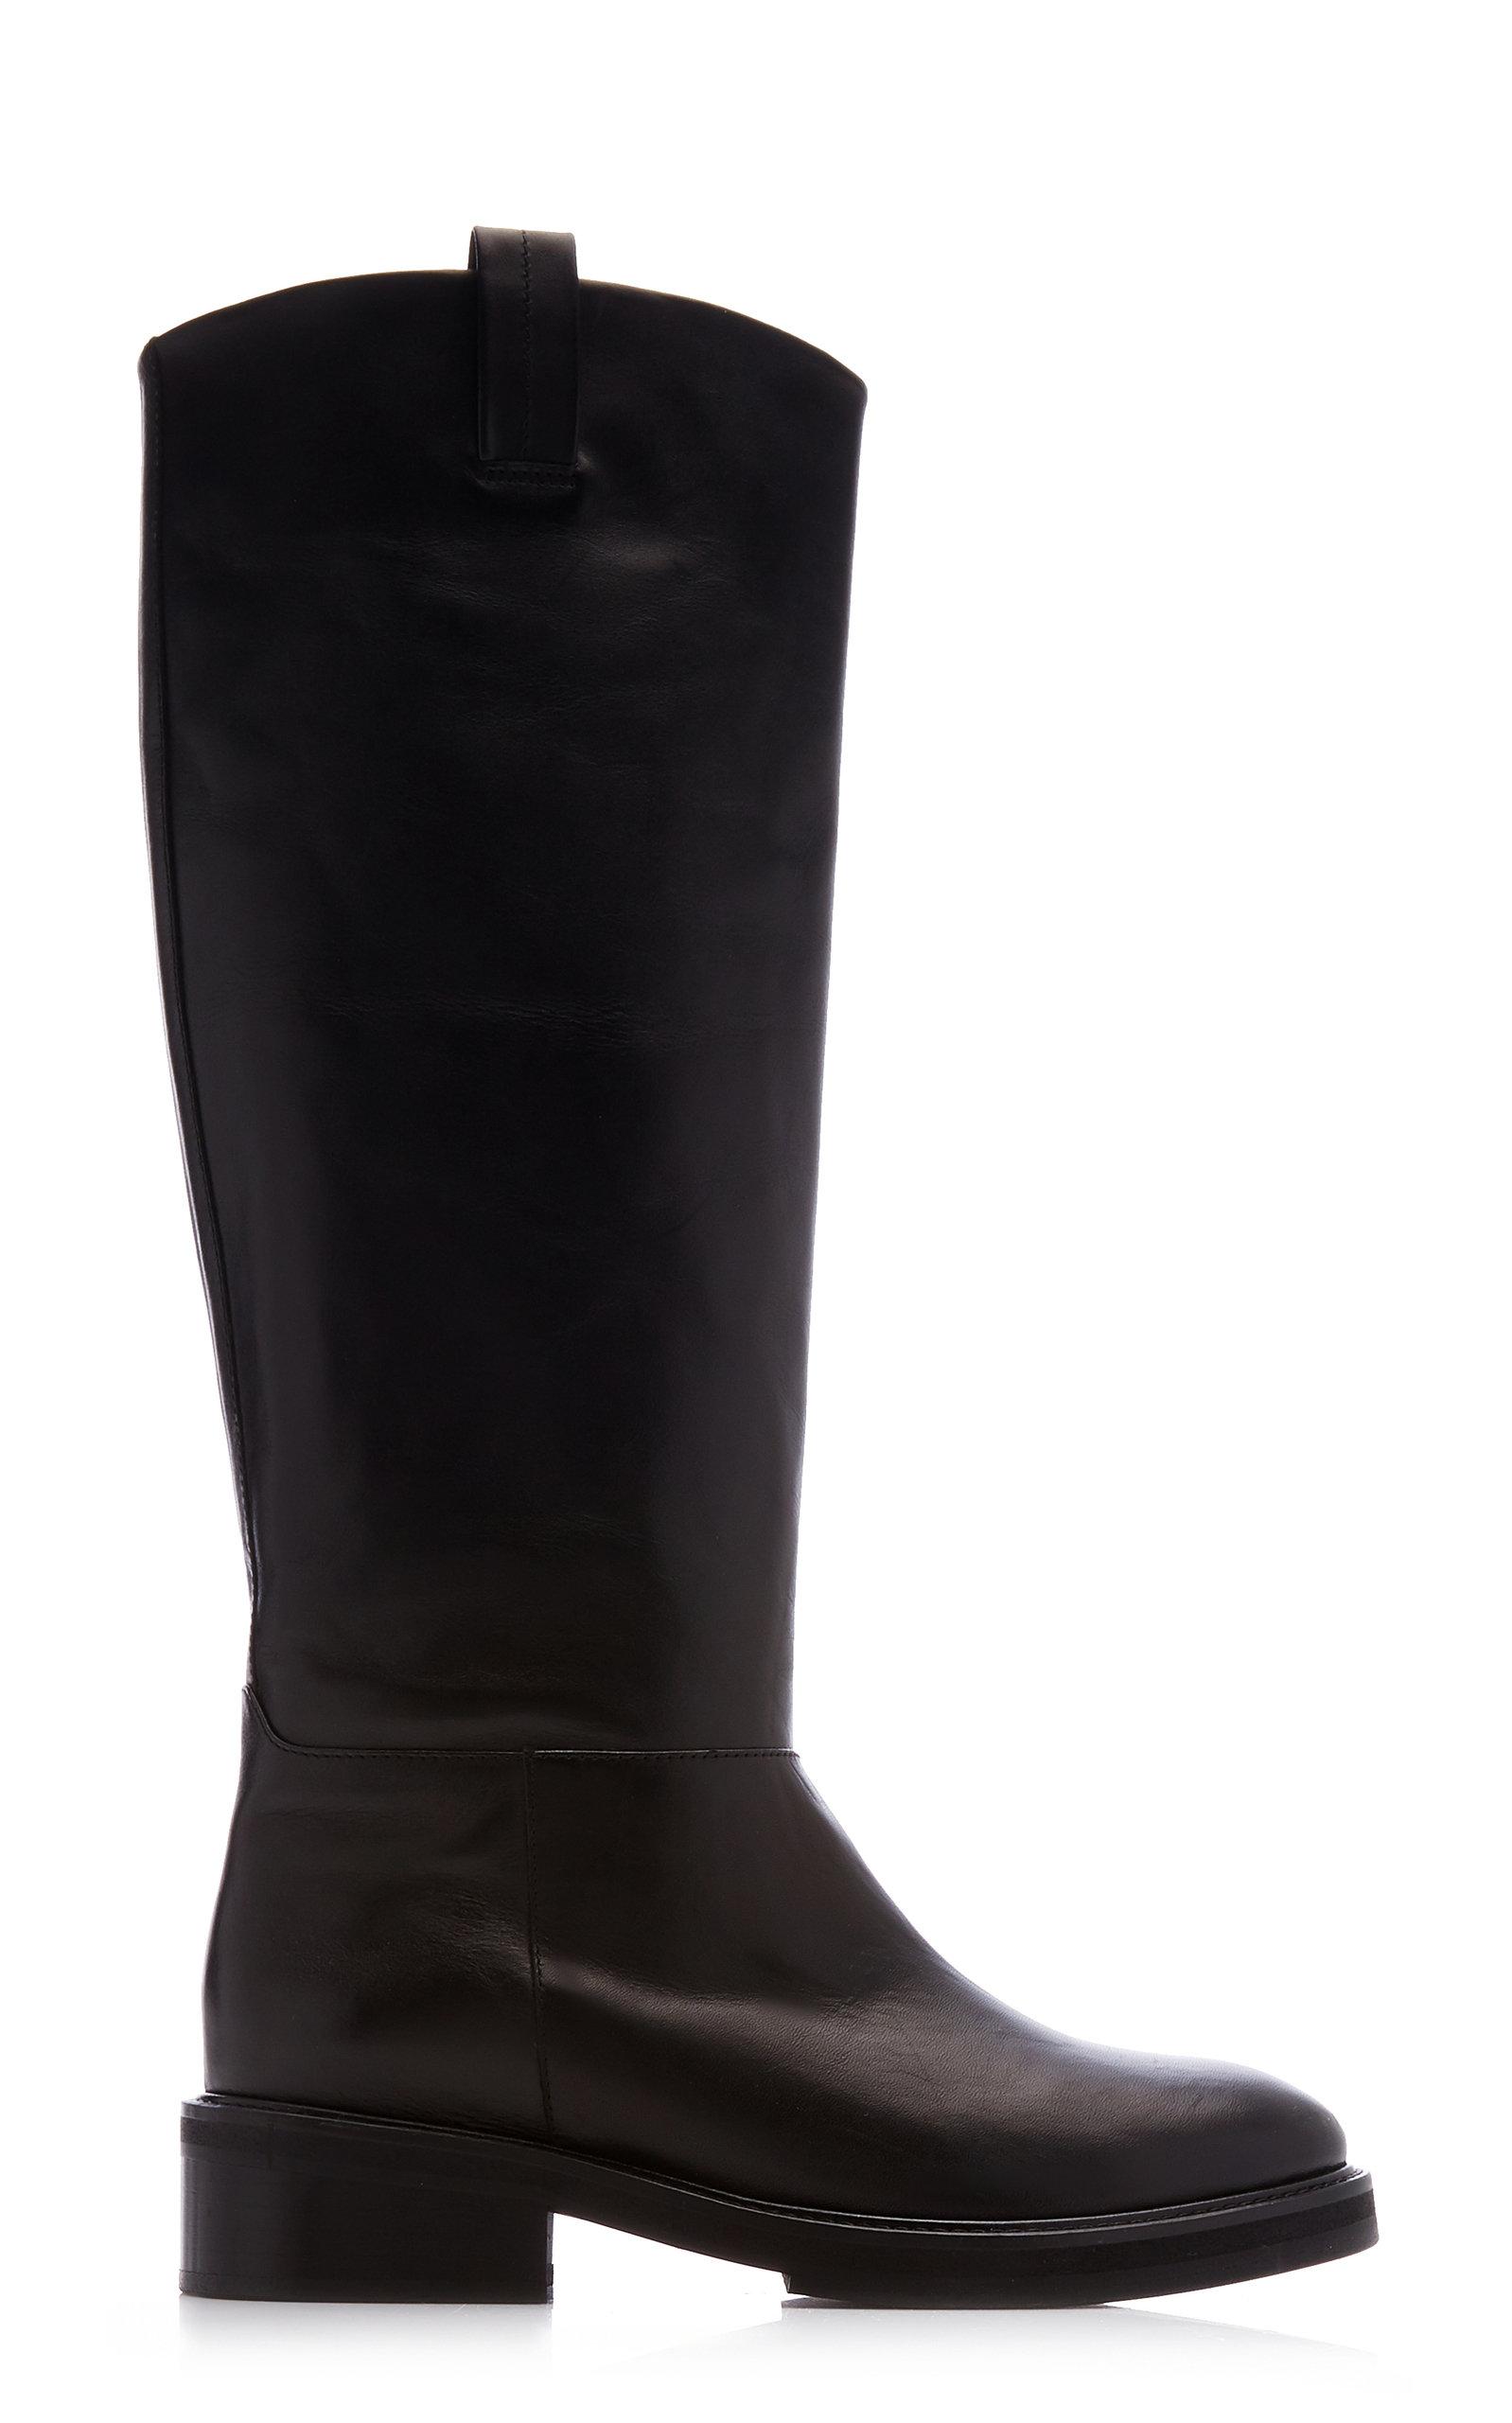 Flattered - Women's Frances Leather Knee High Boots - Black - Moda Operandi